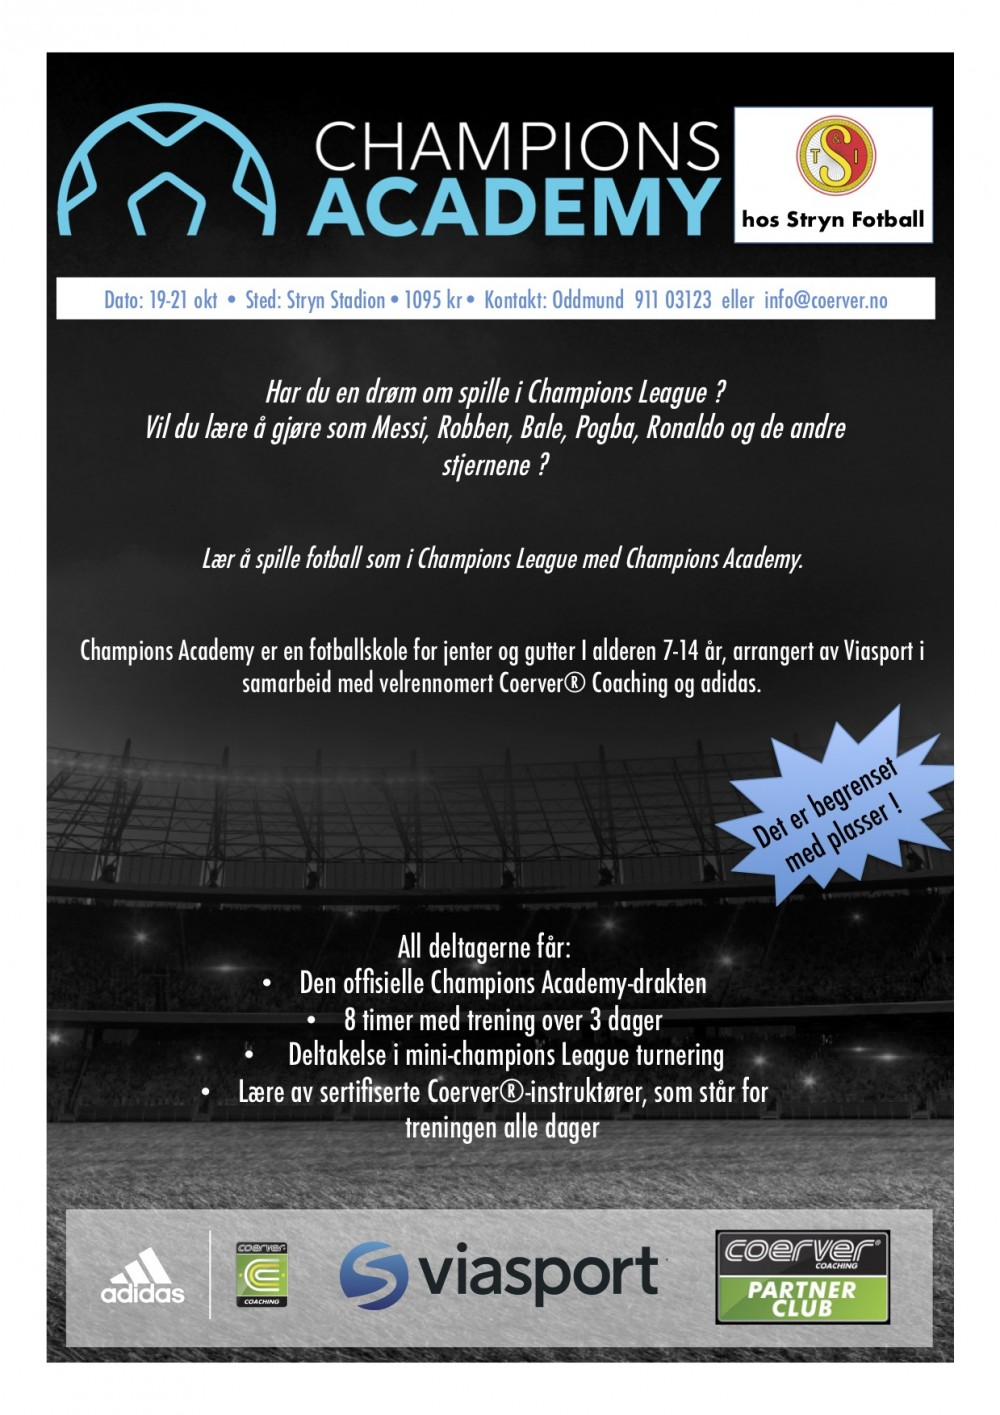 Champions Academy hos Stryn Fotball 19-21 okt